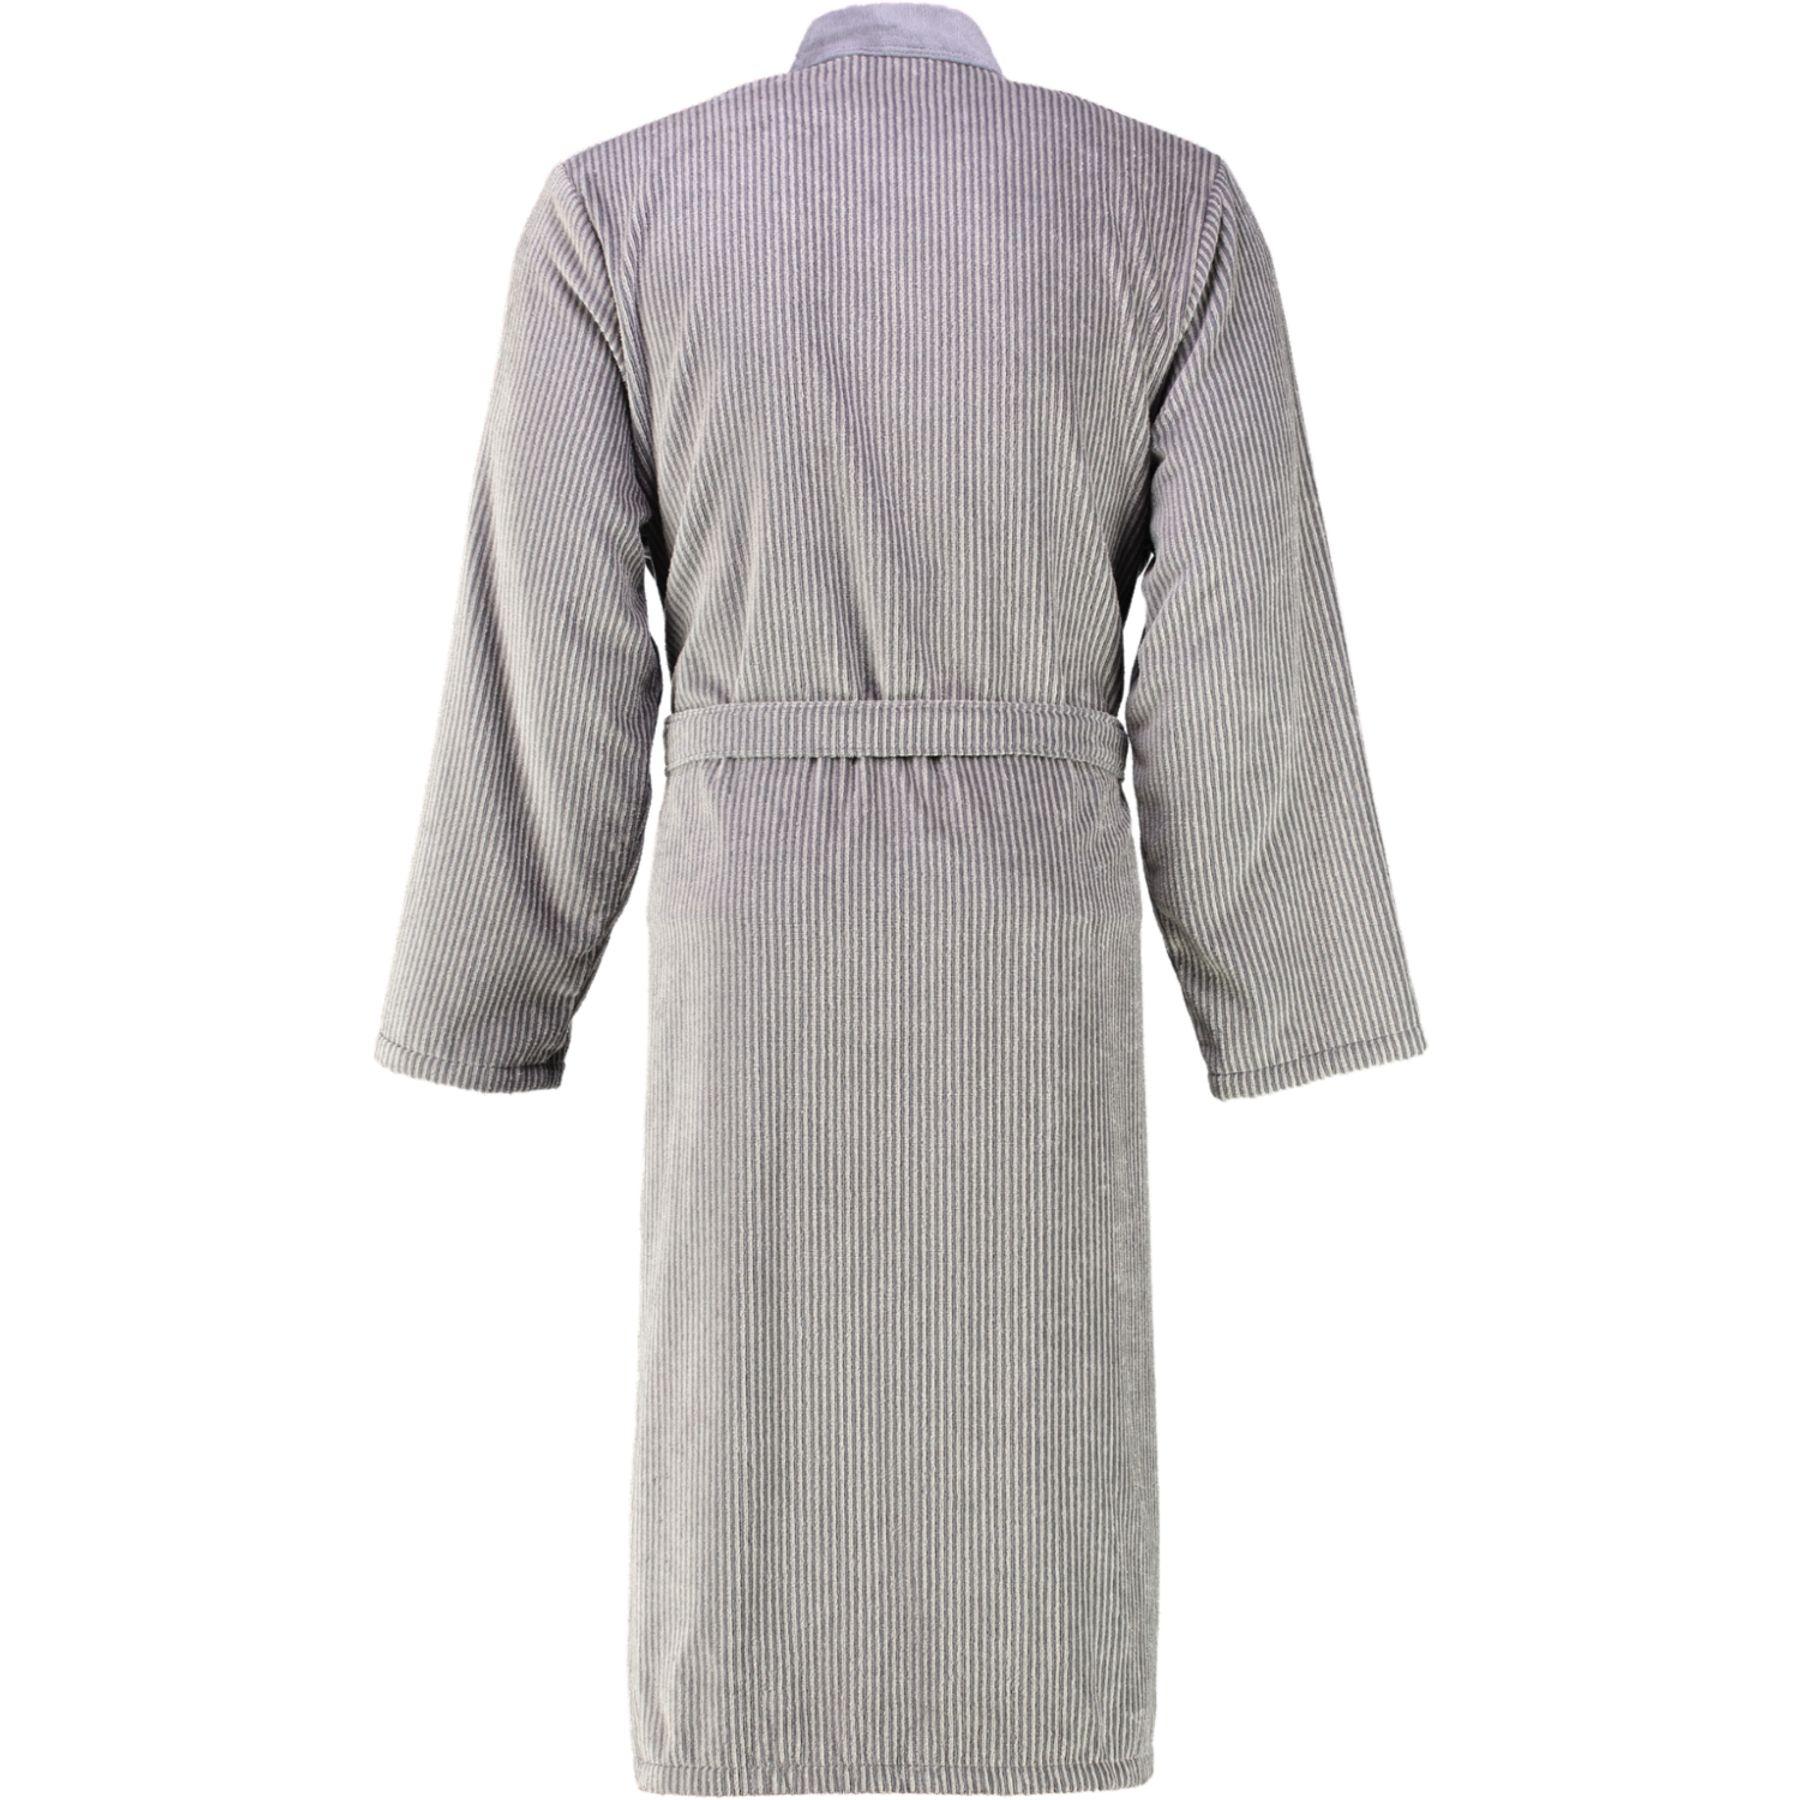 Cawö - Herren Velours Bademantel in Kimono Form (5840) – Bild 7